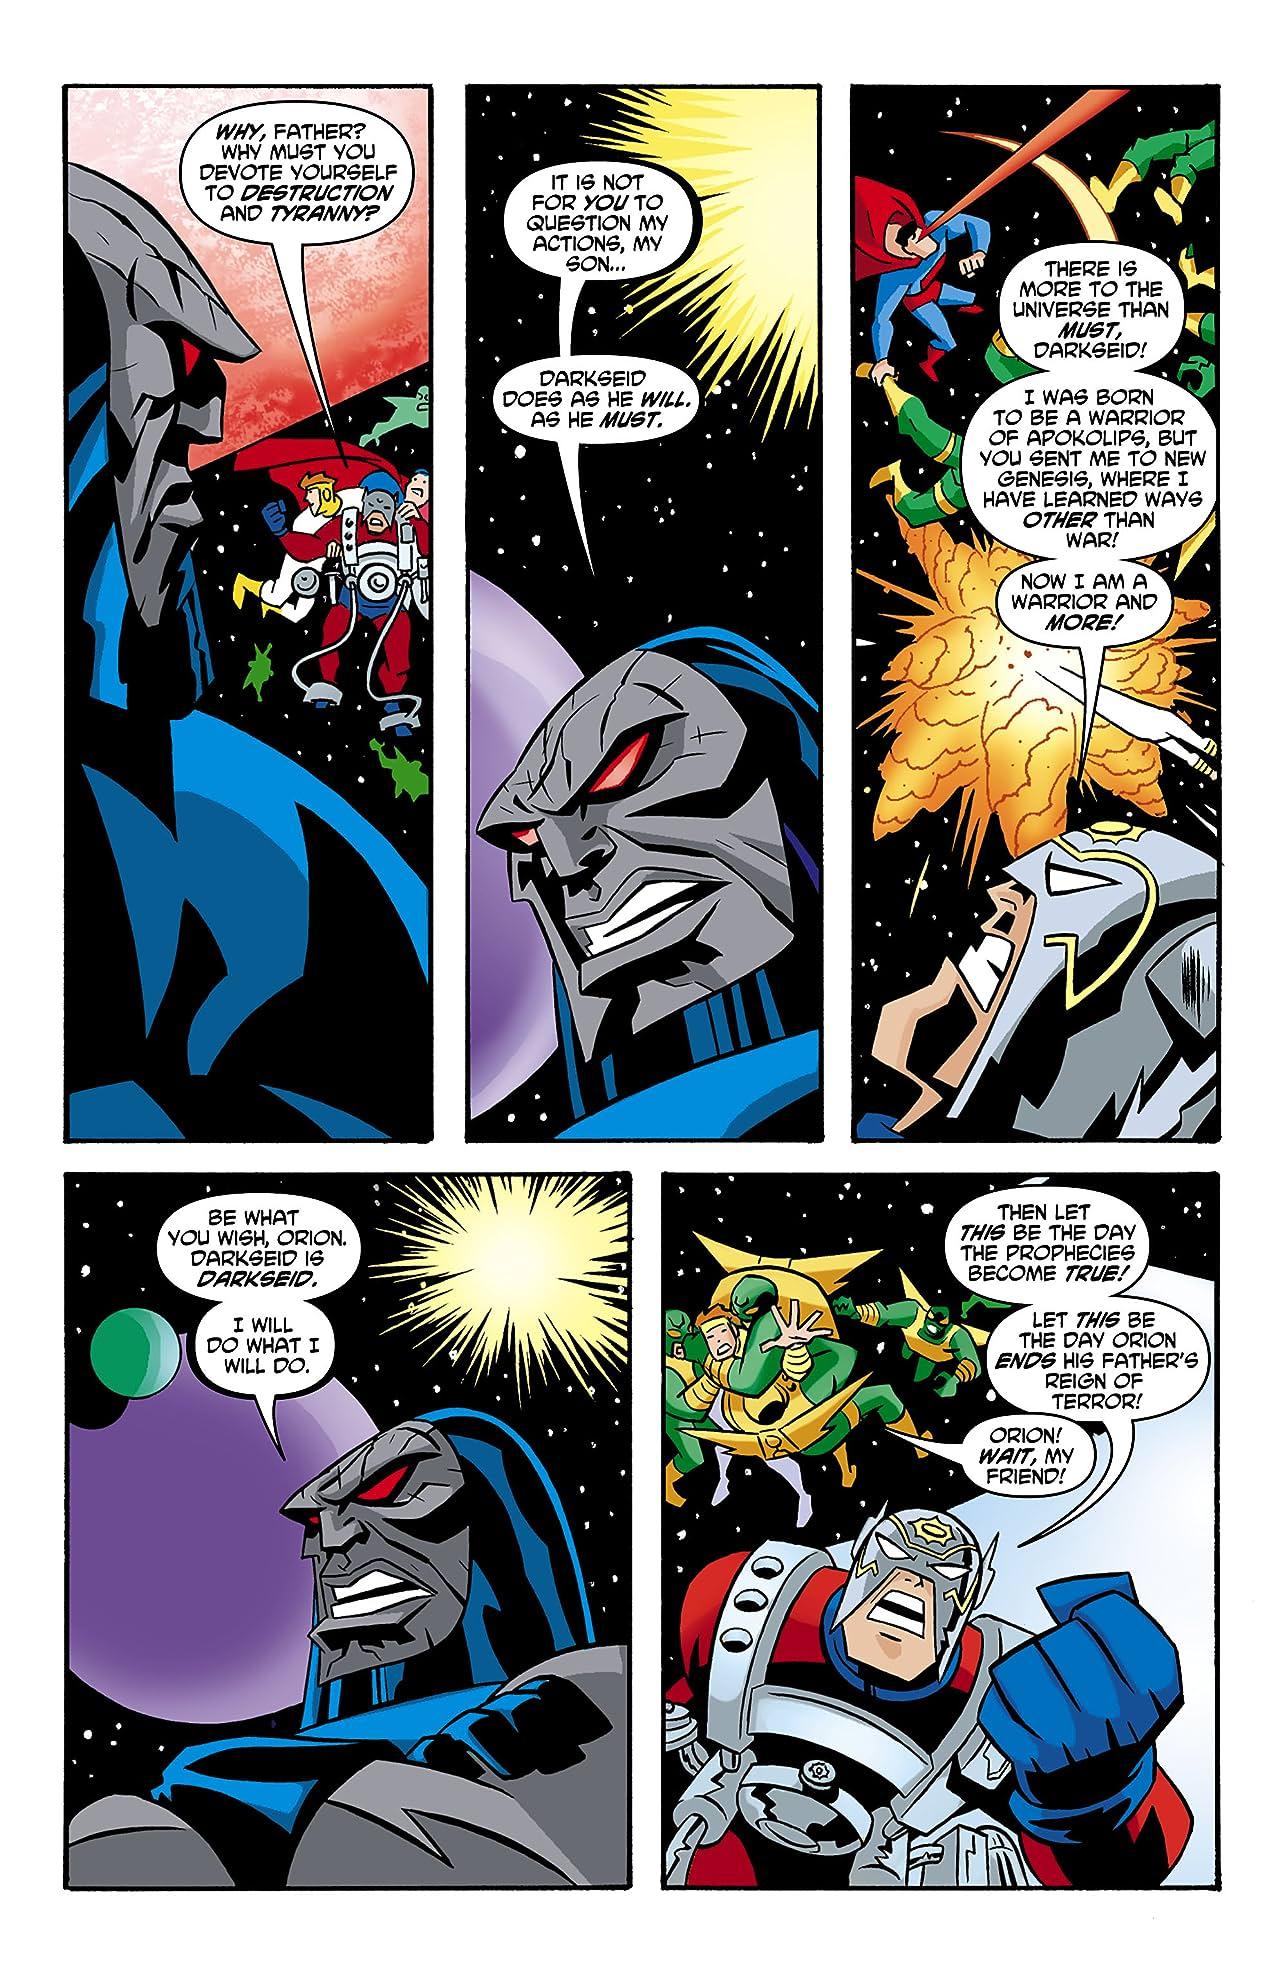 Justice League Unlimited #7